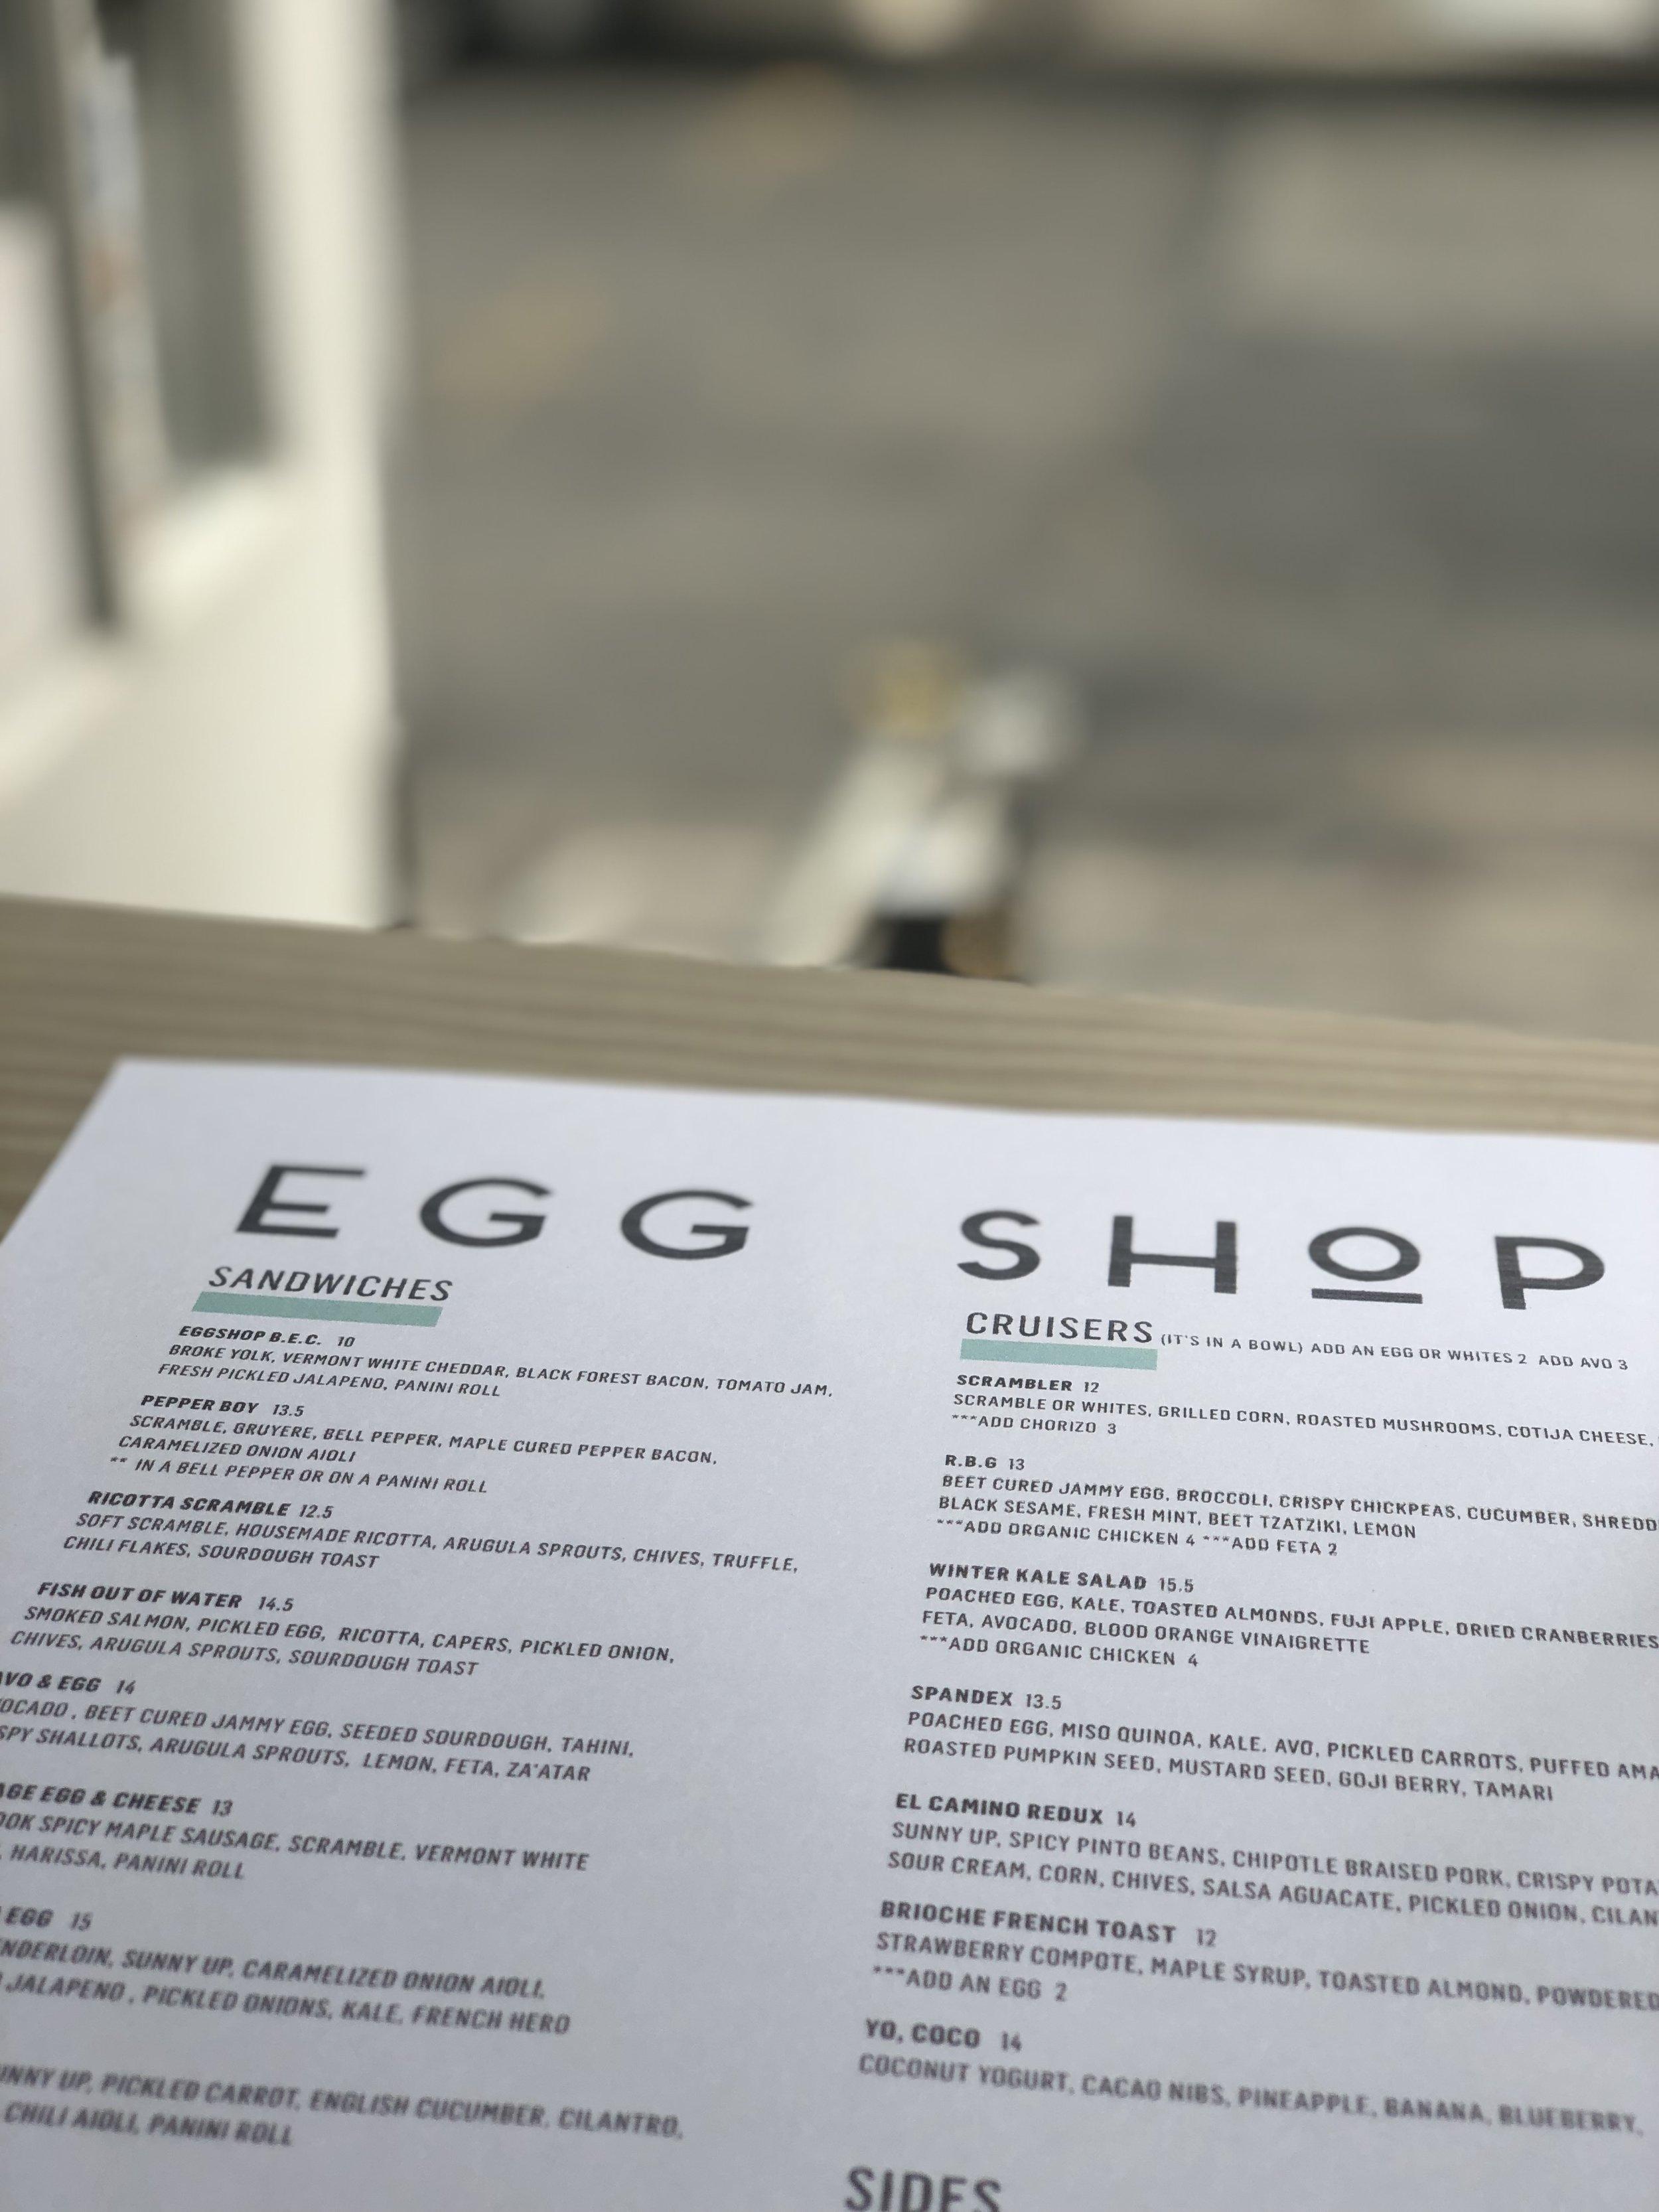 nyc egg shop 2.jpg